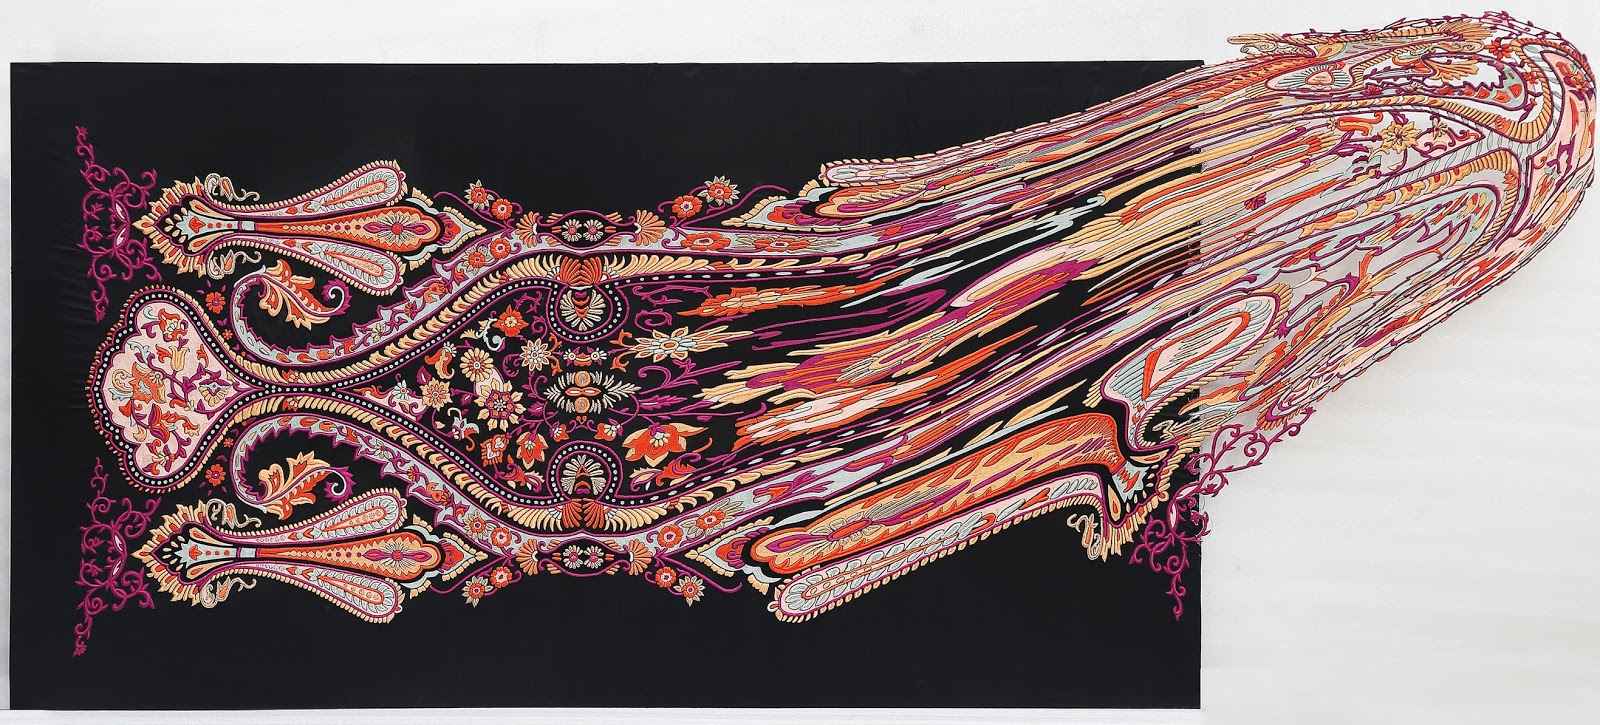 Faig Ahmeds dekonstruierte Teppiche  Teppichkunst der